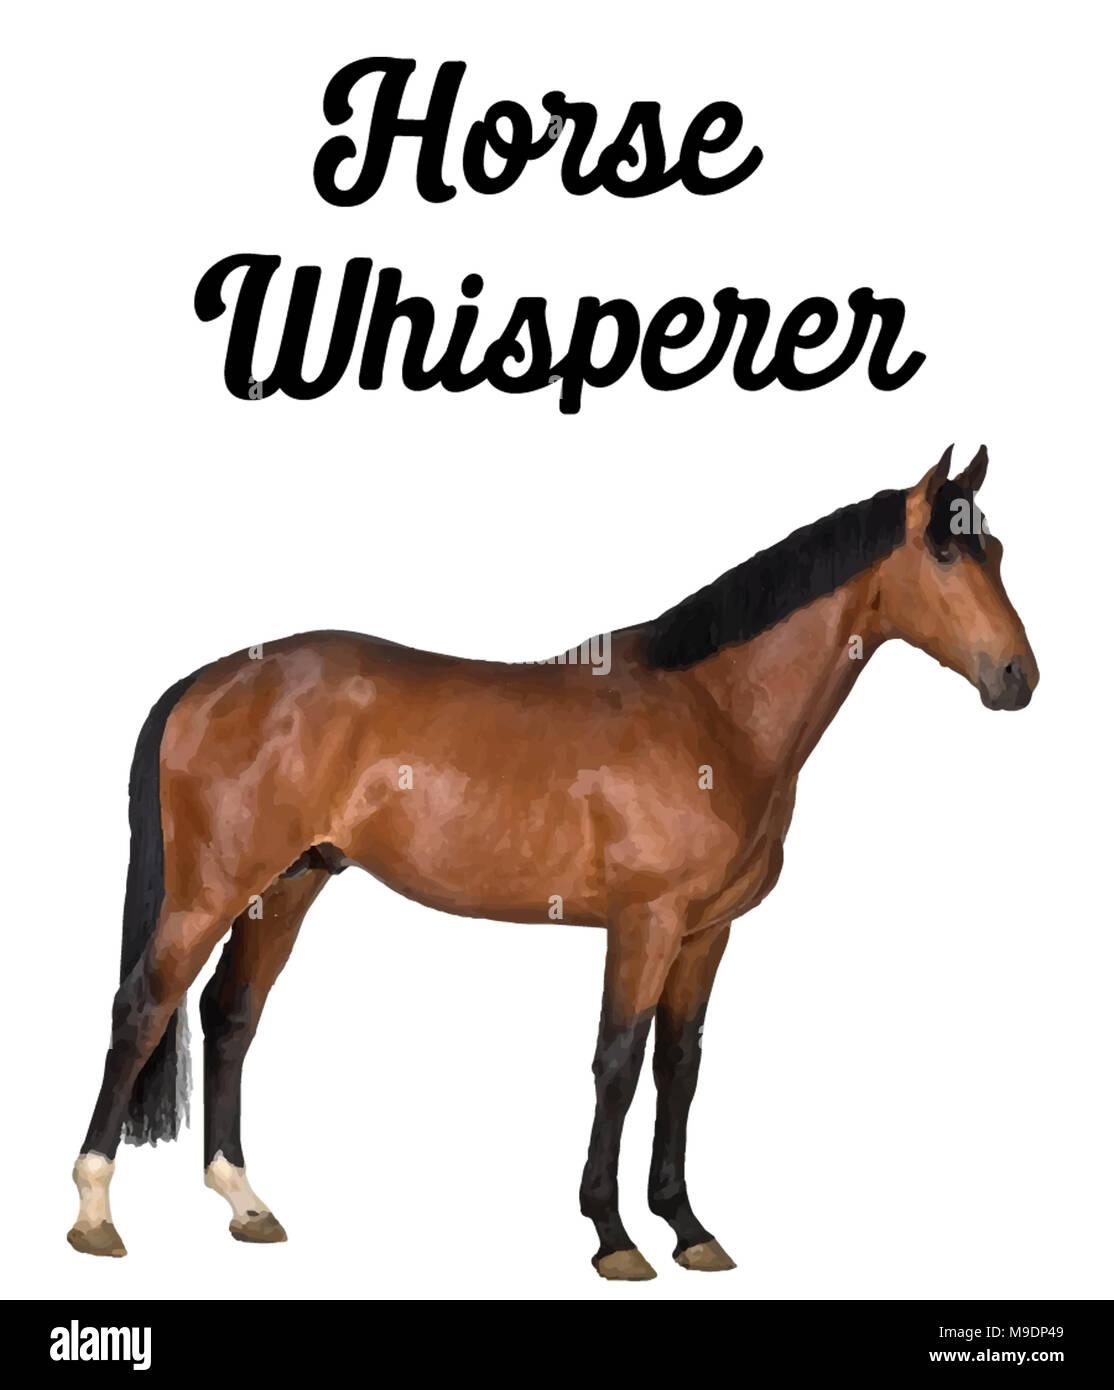 Horse Whisperer Stock Photo